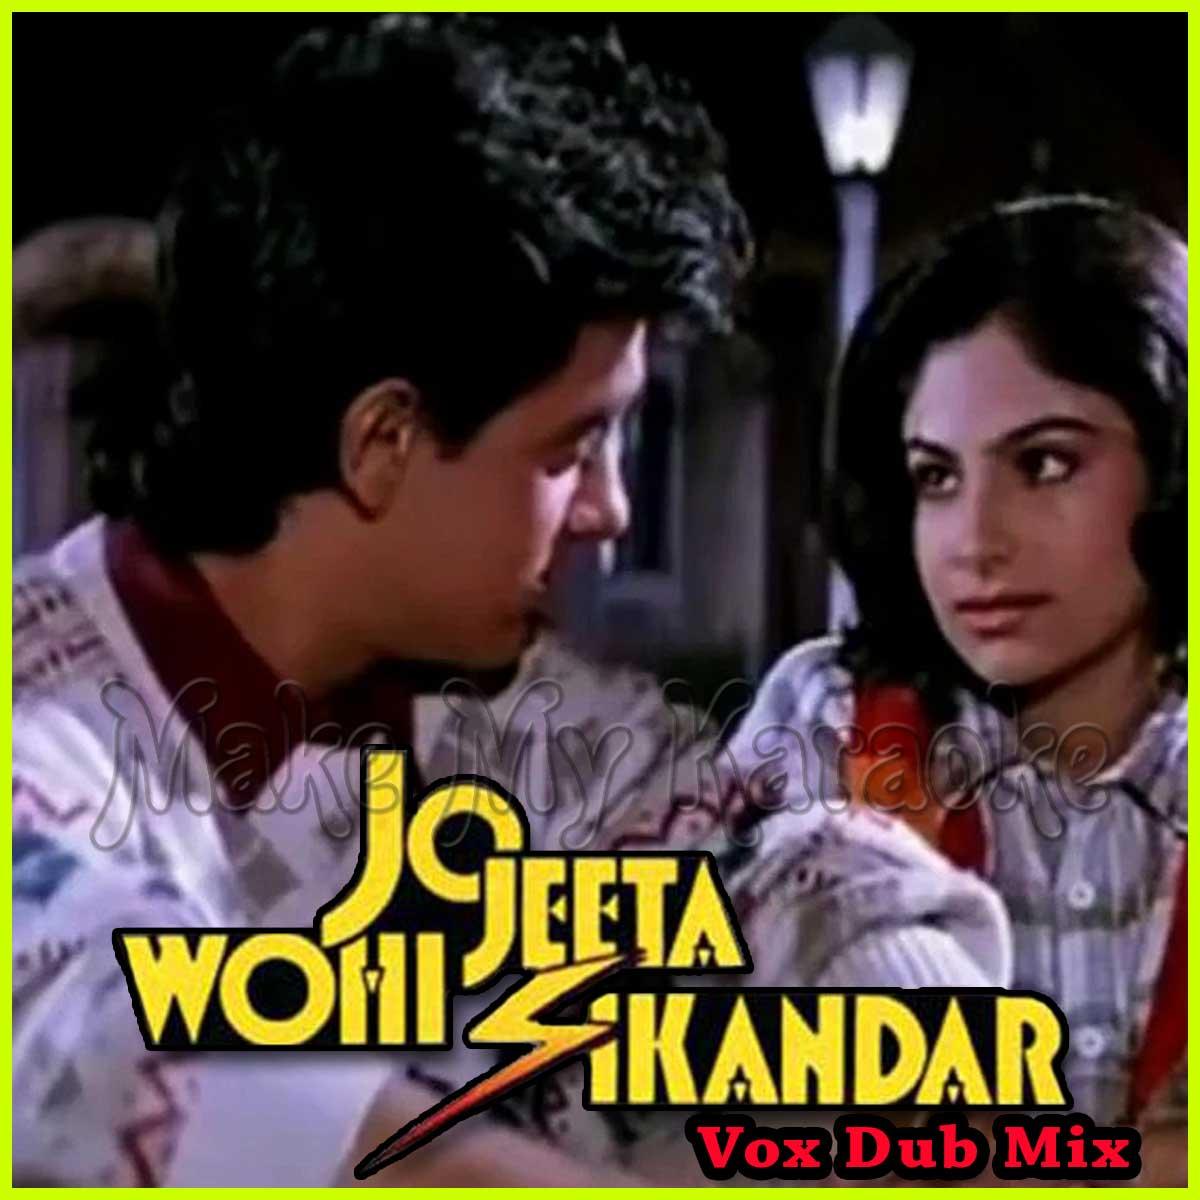 Udit Narayan Jo Jeeta Wohi Sikandar Pehla Nasha Mp3 Download: Pehla Nasha